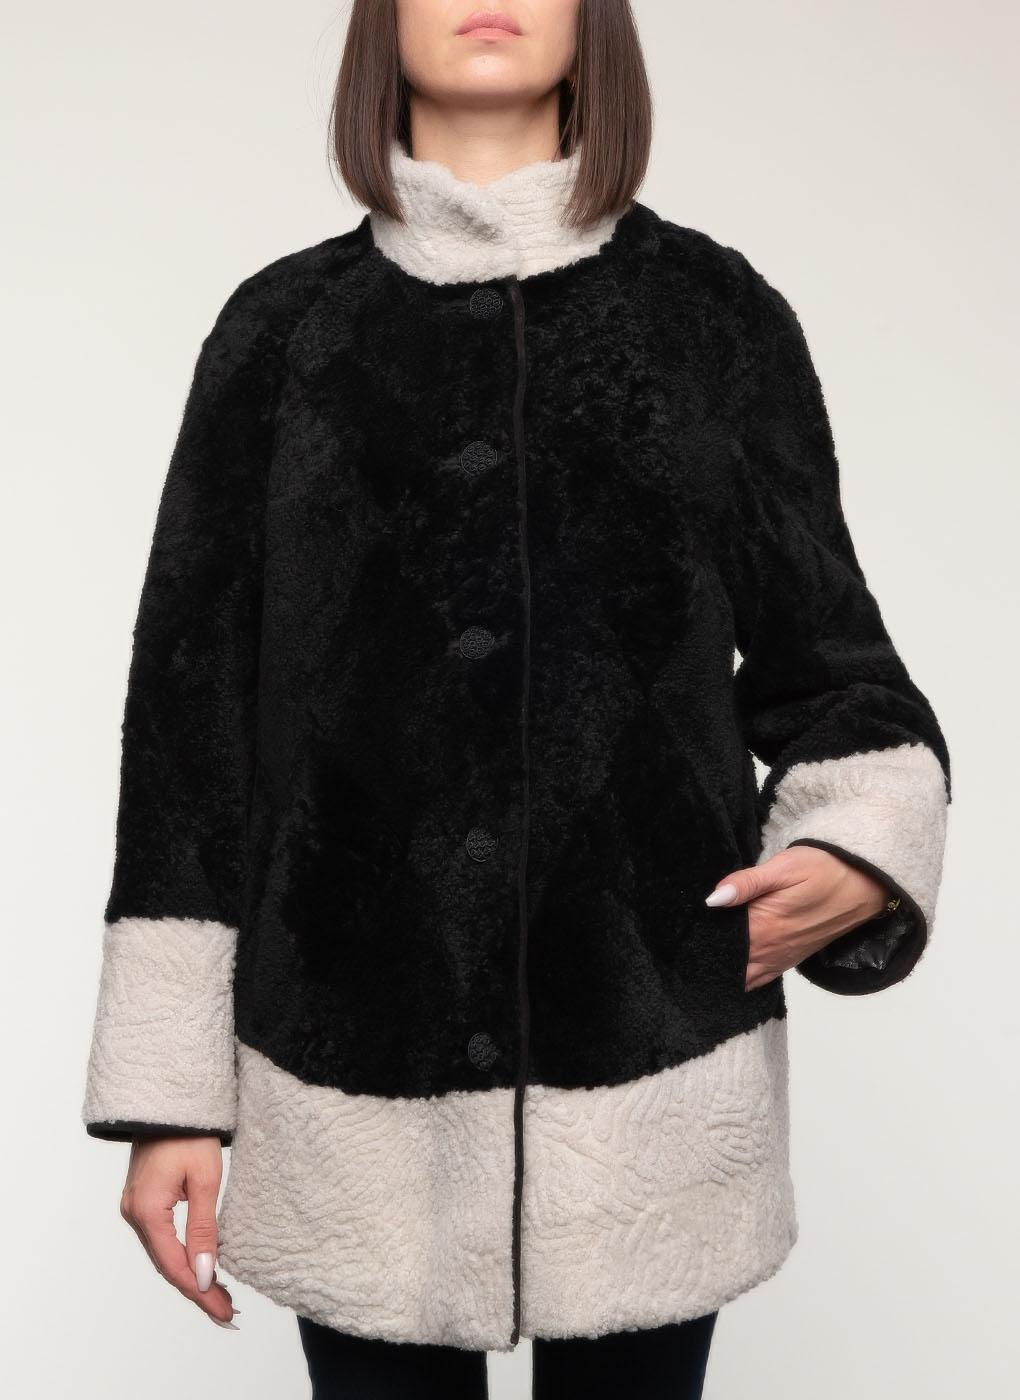 Куртка из овчины прямая 02, Anna Romanova furs фото